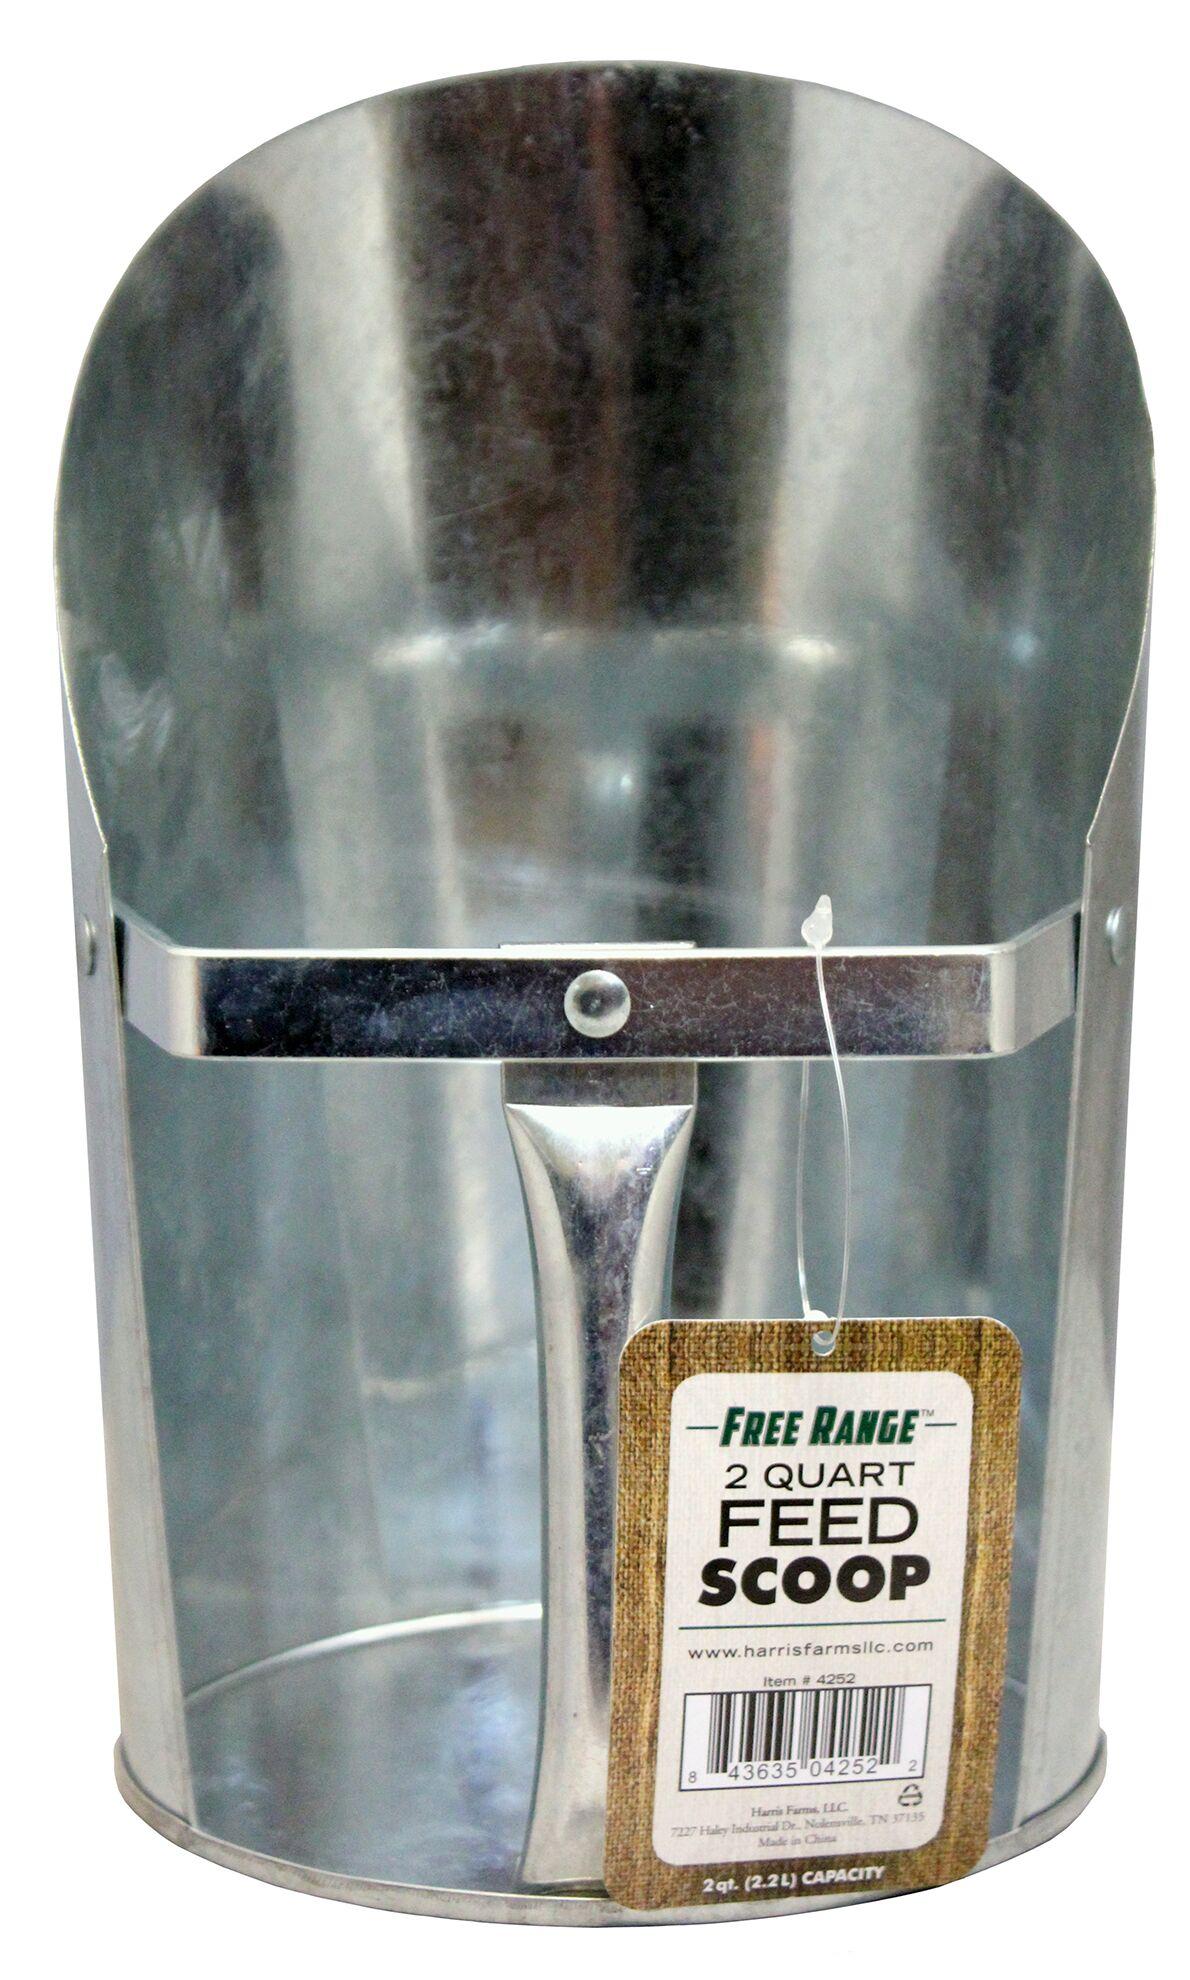 Feed Scoop Size: 2 qt.